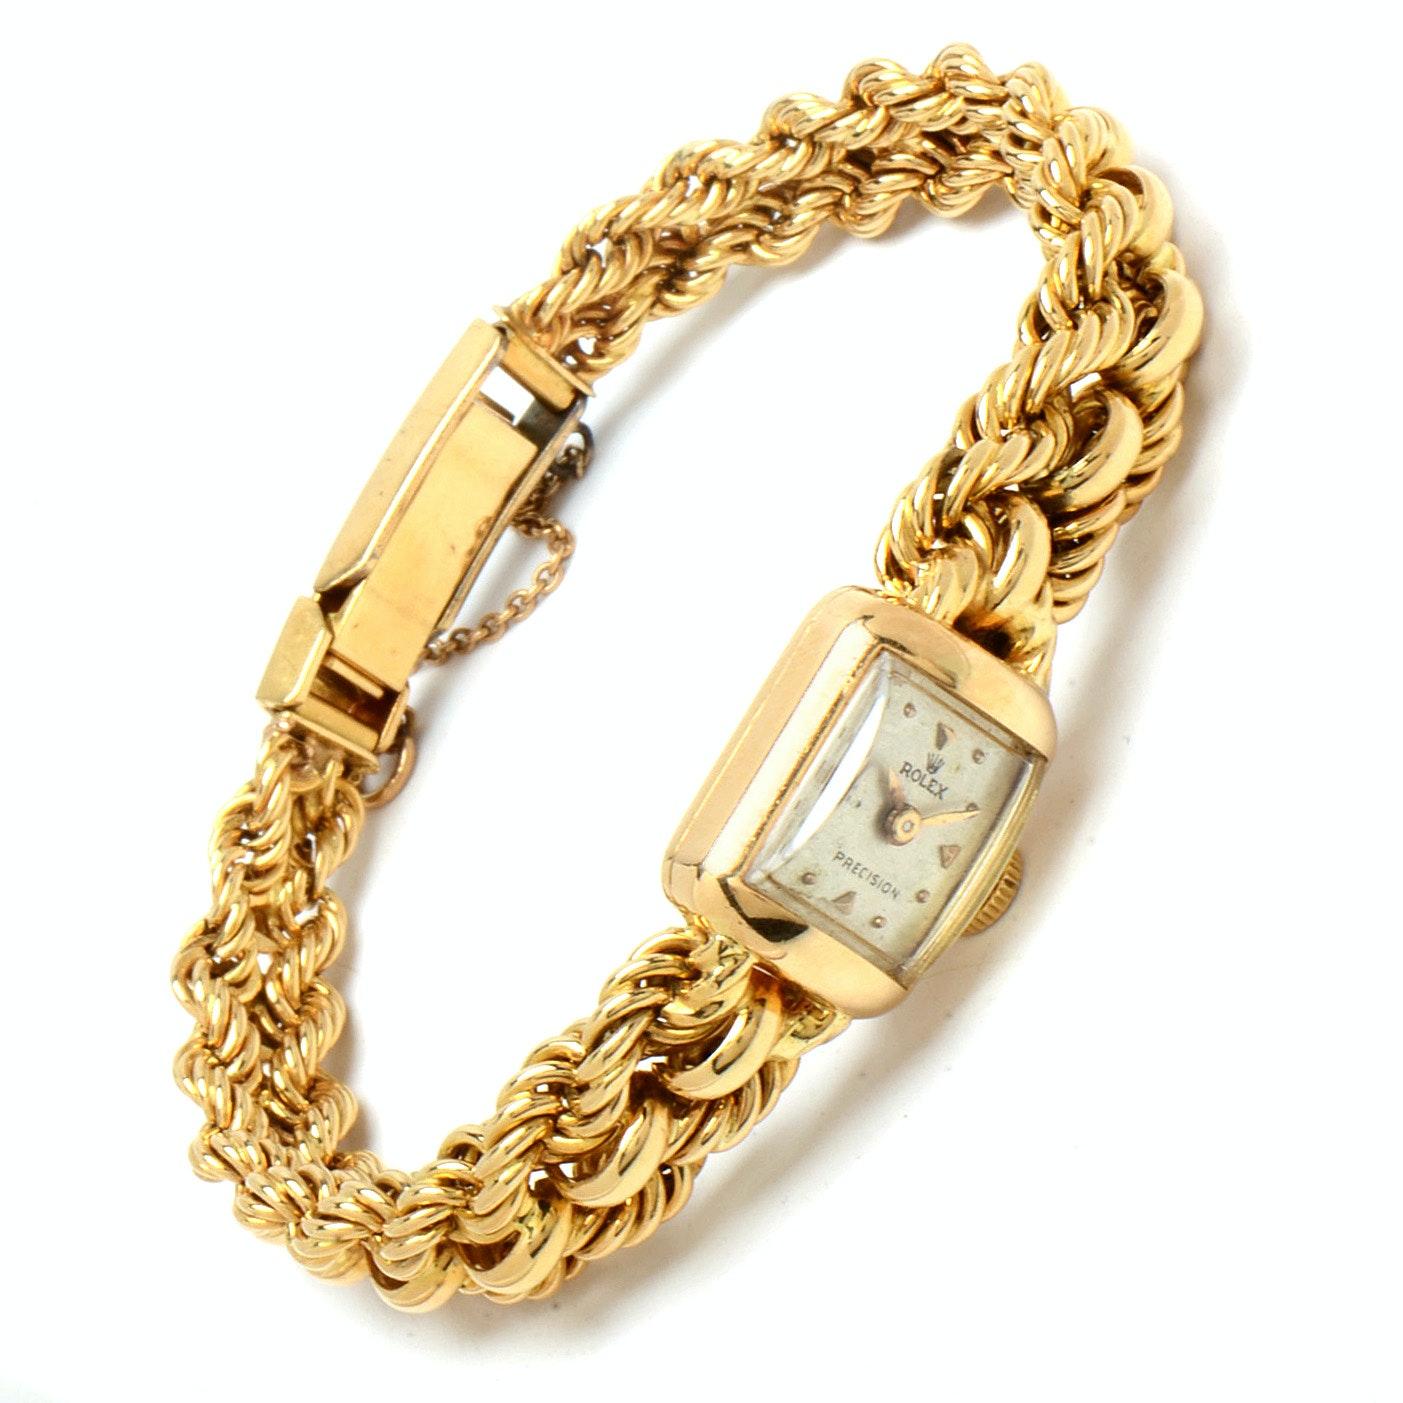 Vintage Rolex Precision 18K Yellow Gold Wristwatch